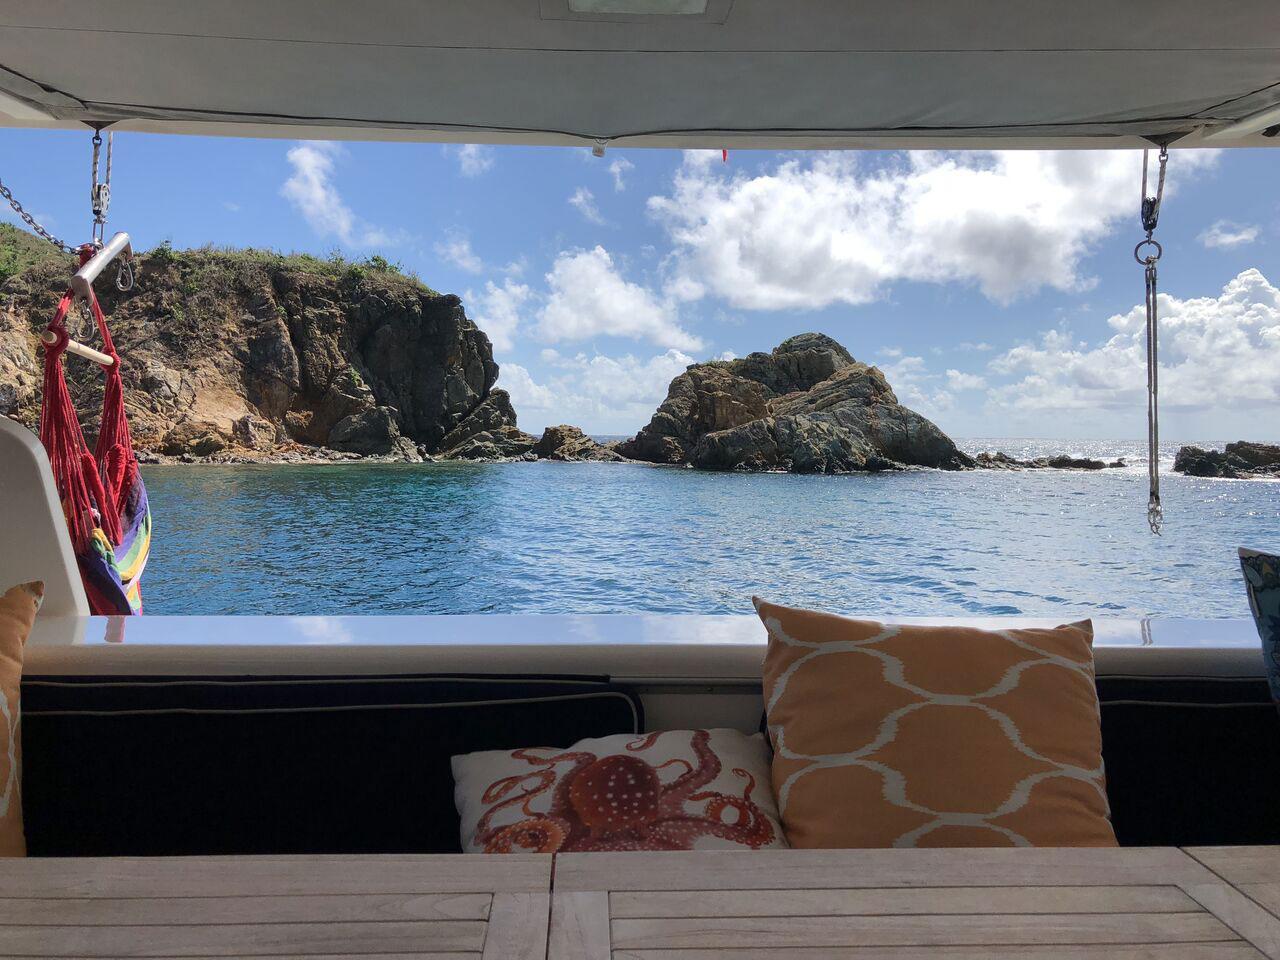 Charter Yacht Zingara - in the British Virgin Islands (BVI)